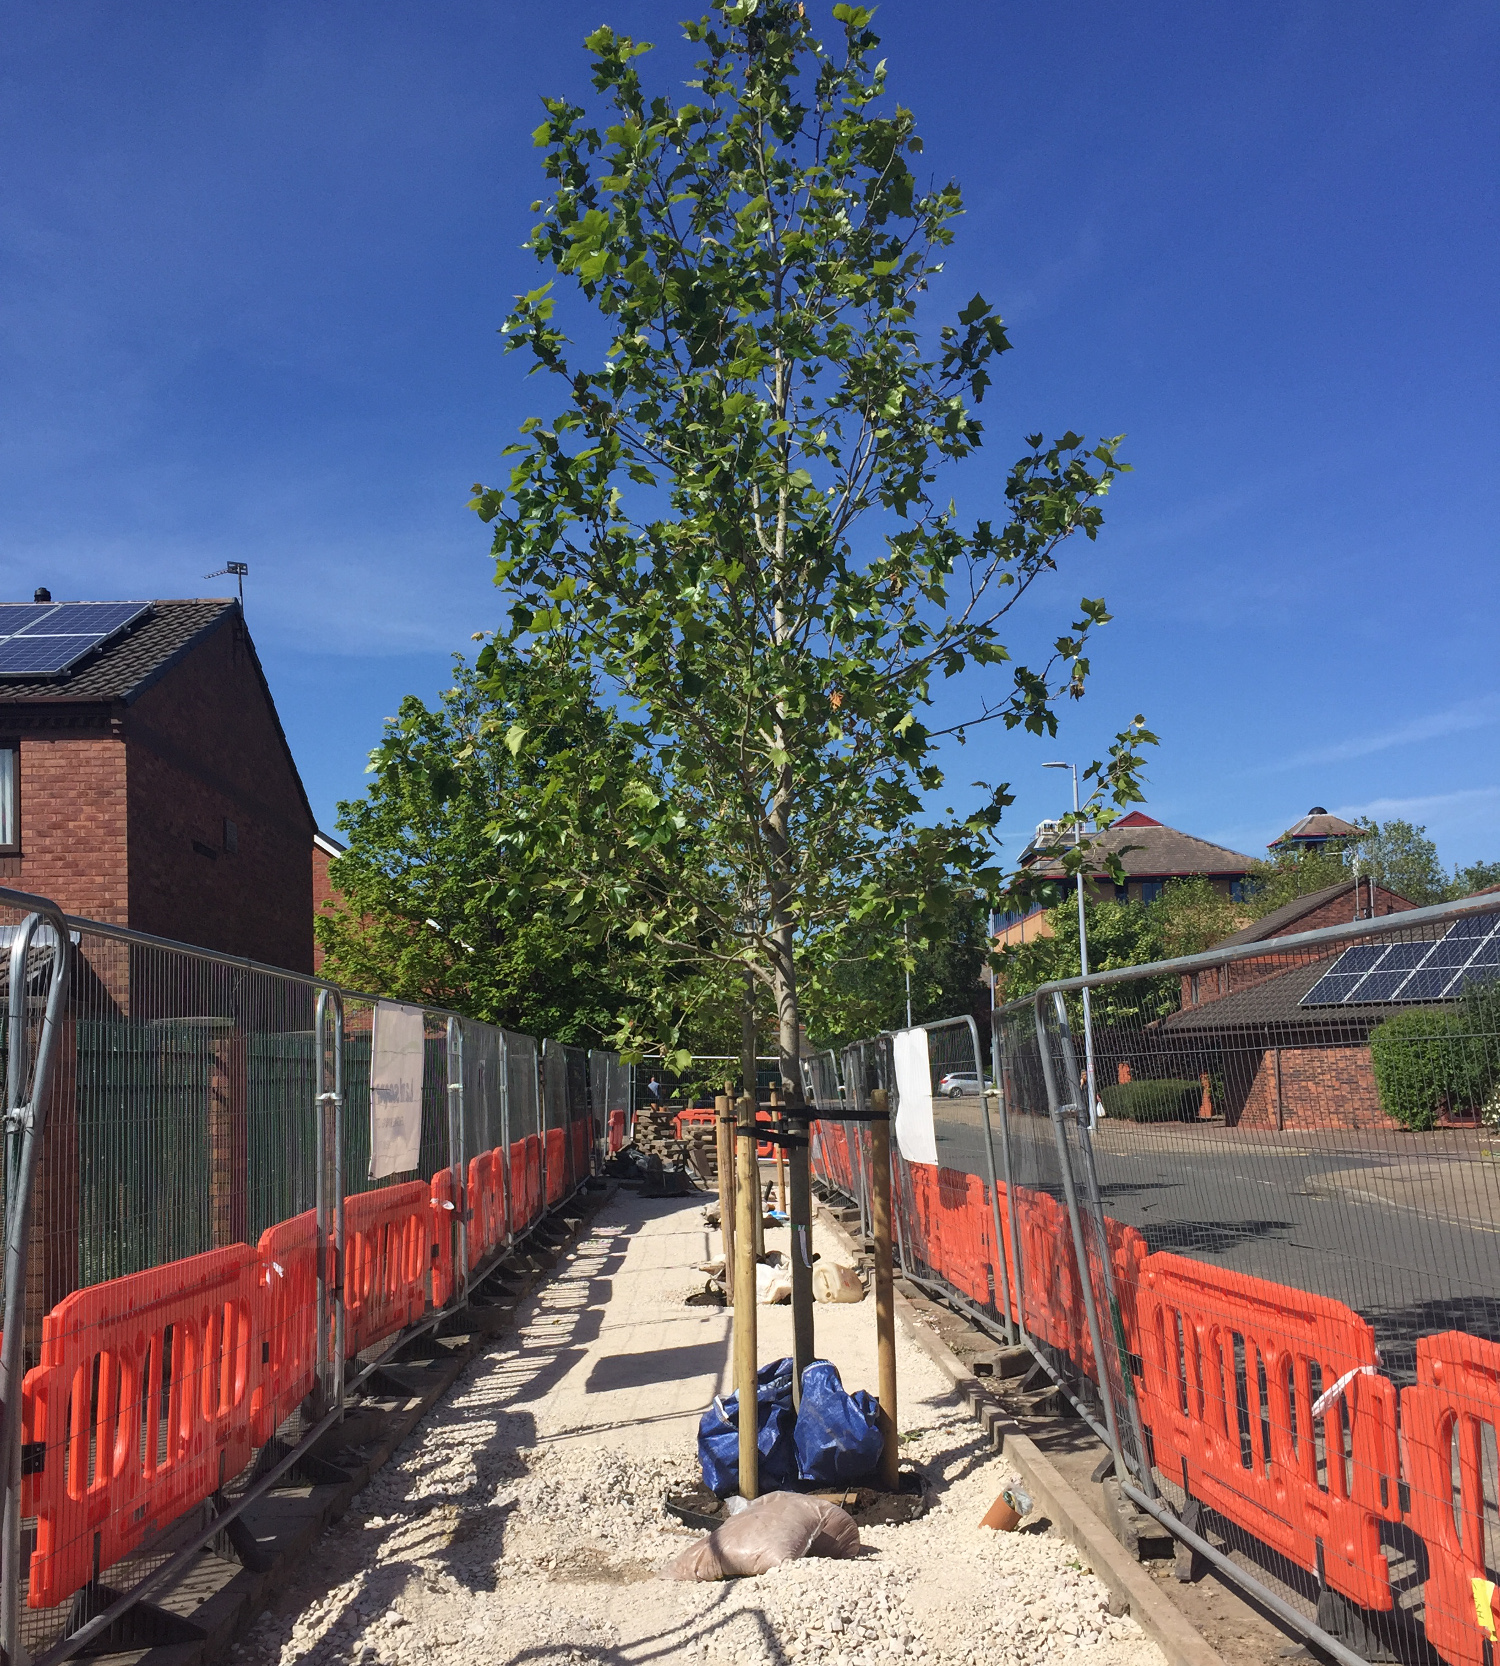 Tree on a sunny day